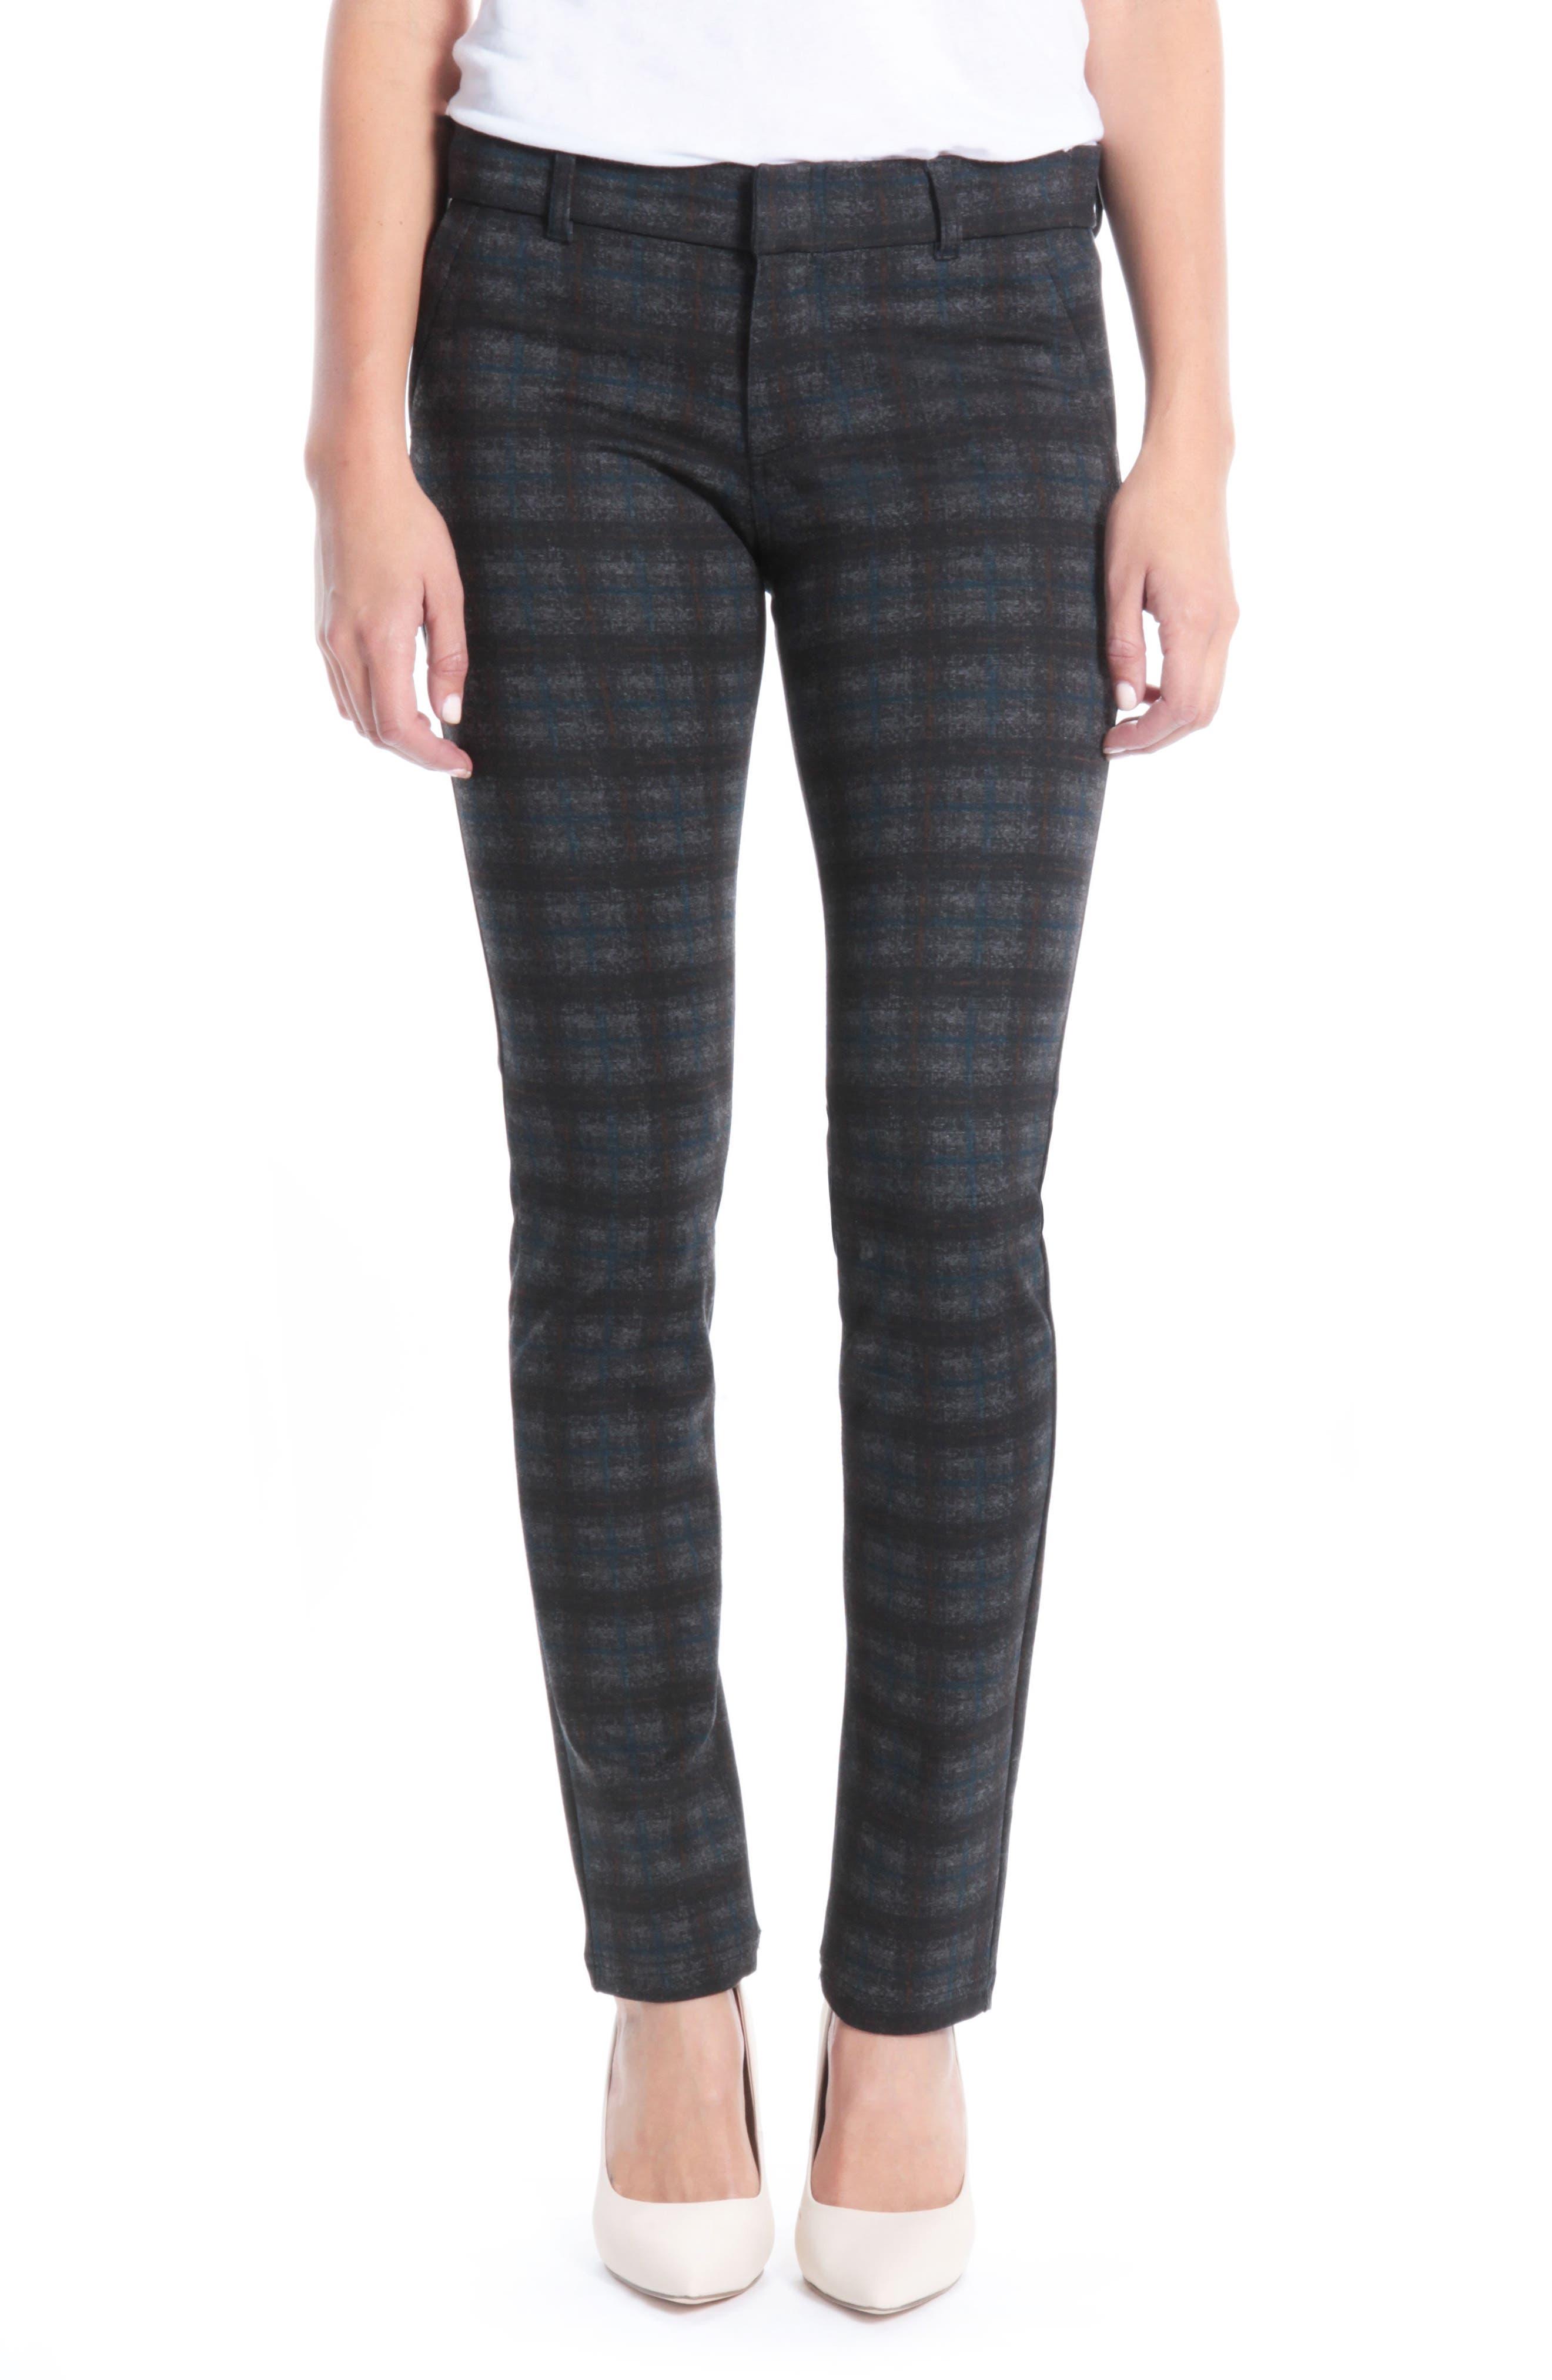 Diana Skinny Jeans,                             Main thumbnail 1, color,                             Grey/ Blue/ Gold